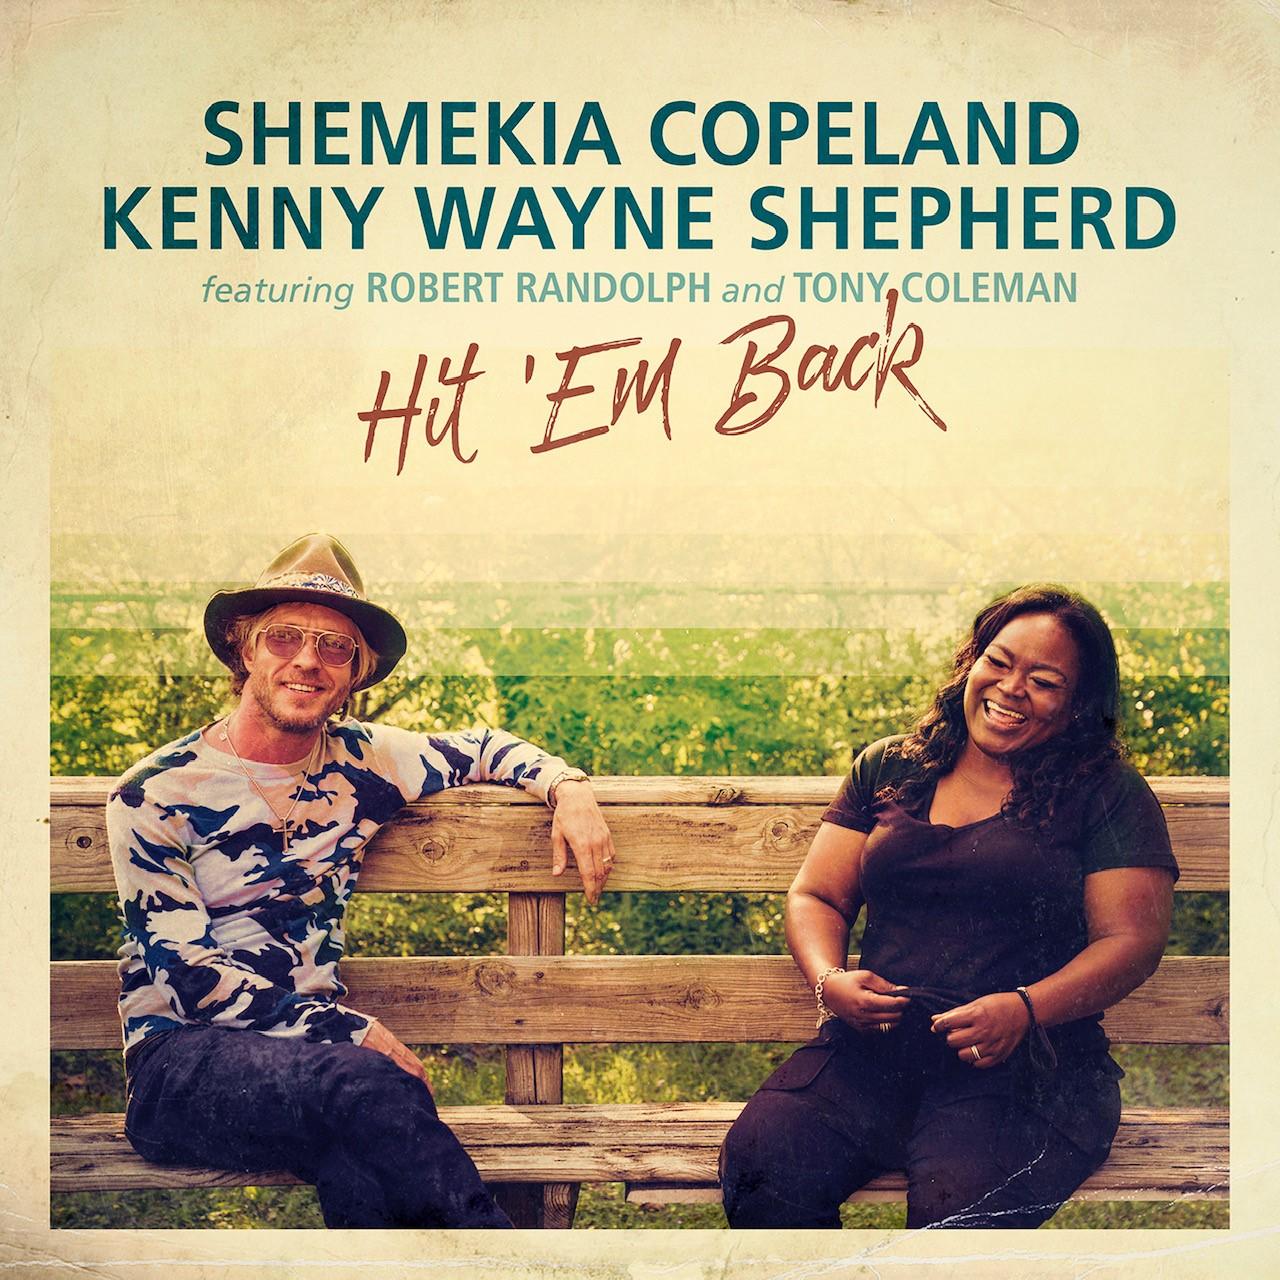 <h5>Shemekia Copeland  <br> & Kenny Wayne Shepherd<br>Hit 'Em Back</h5>